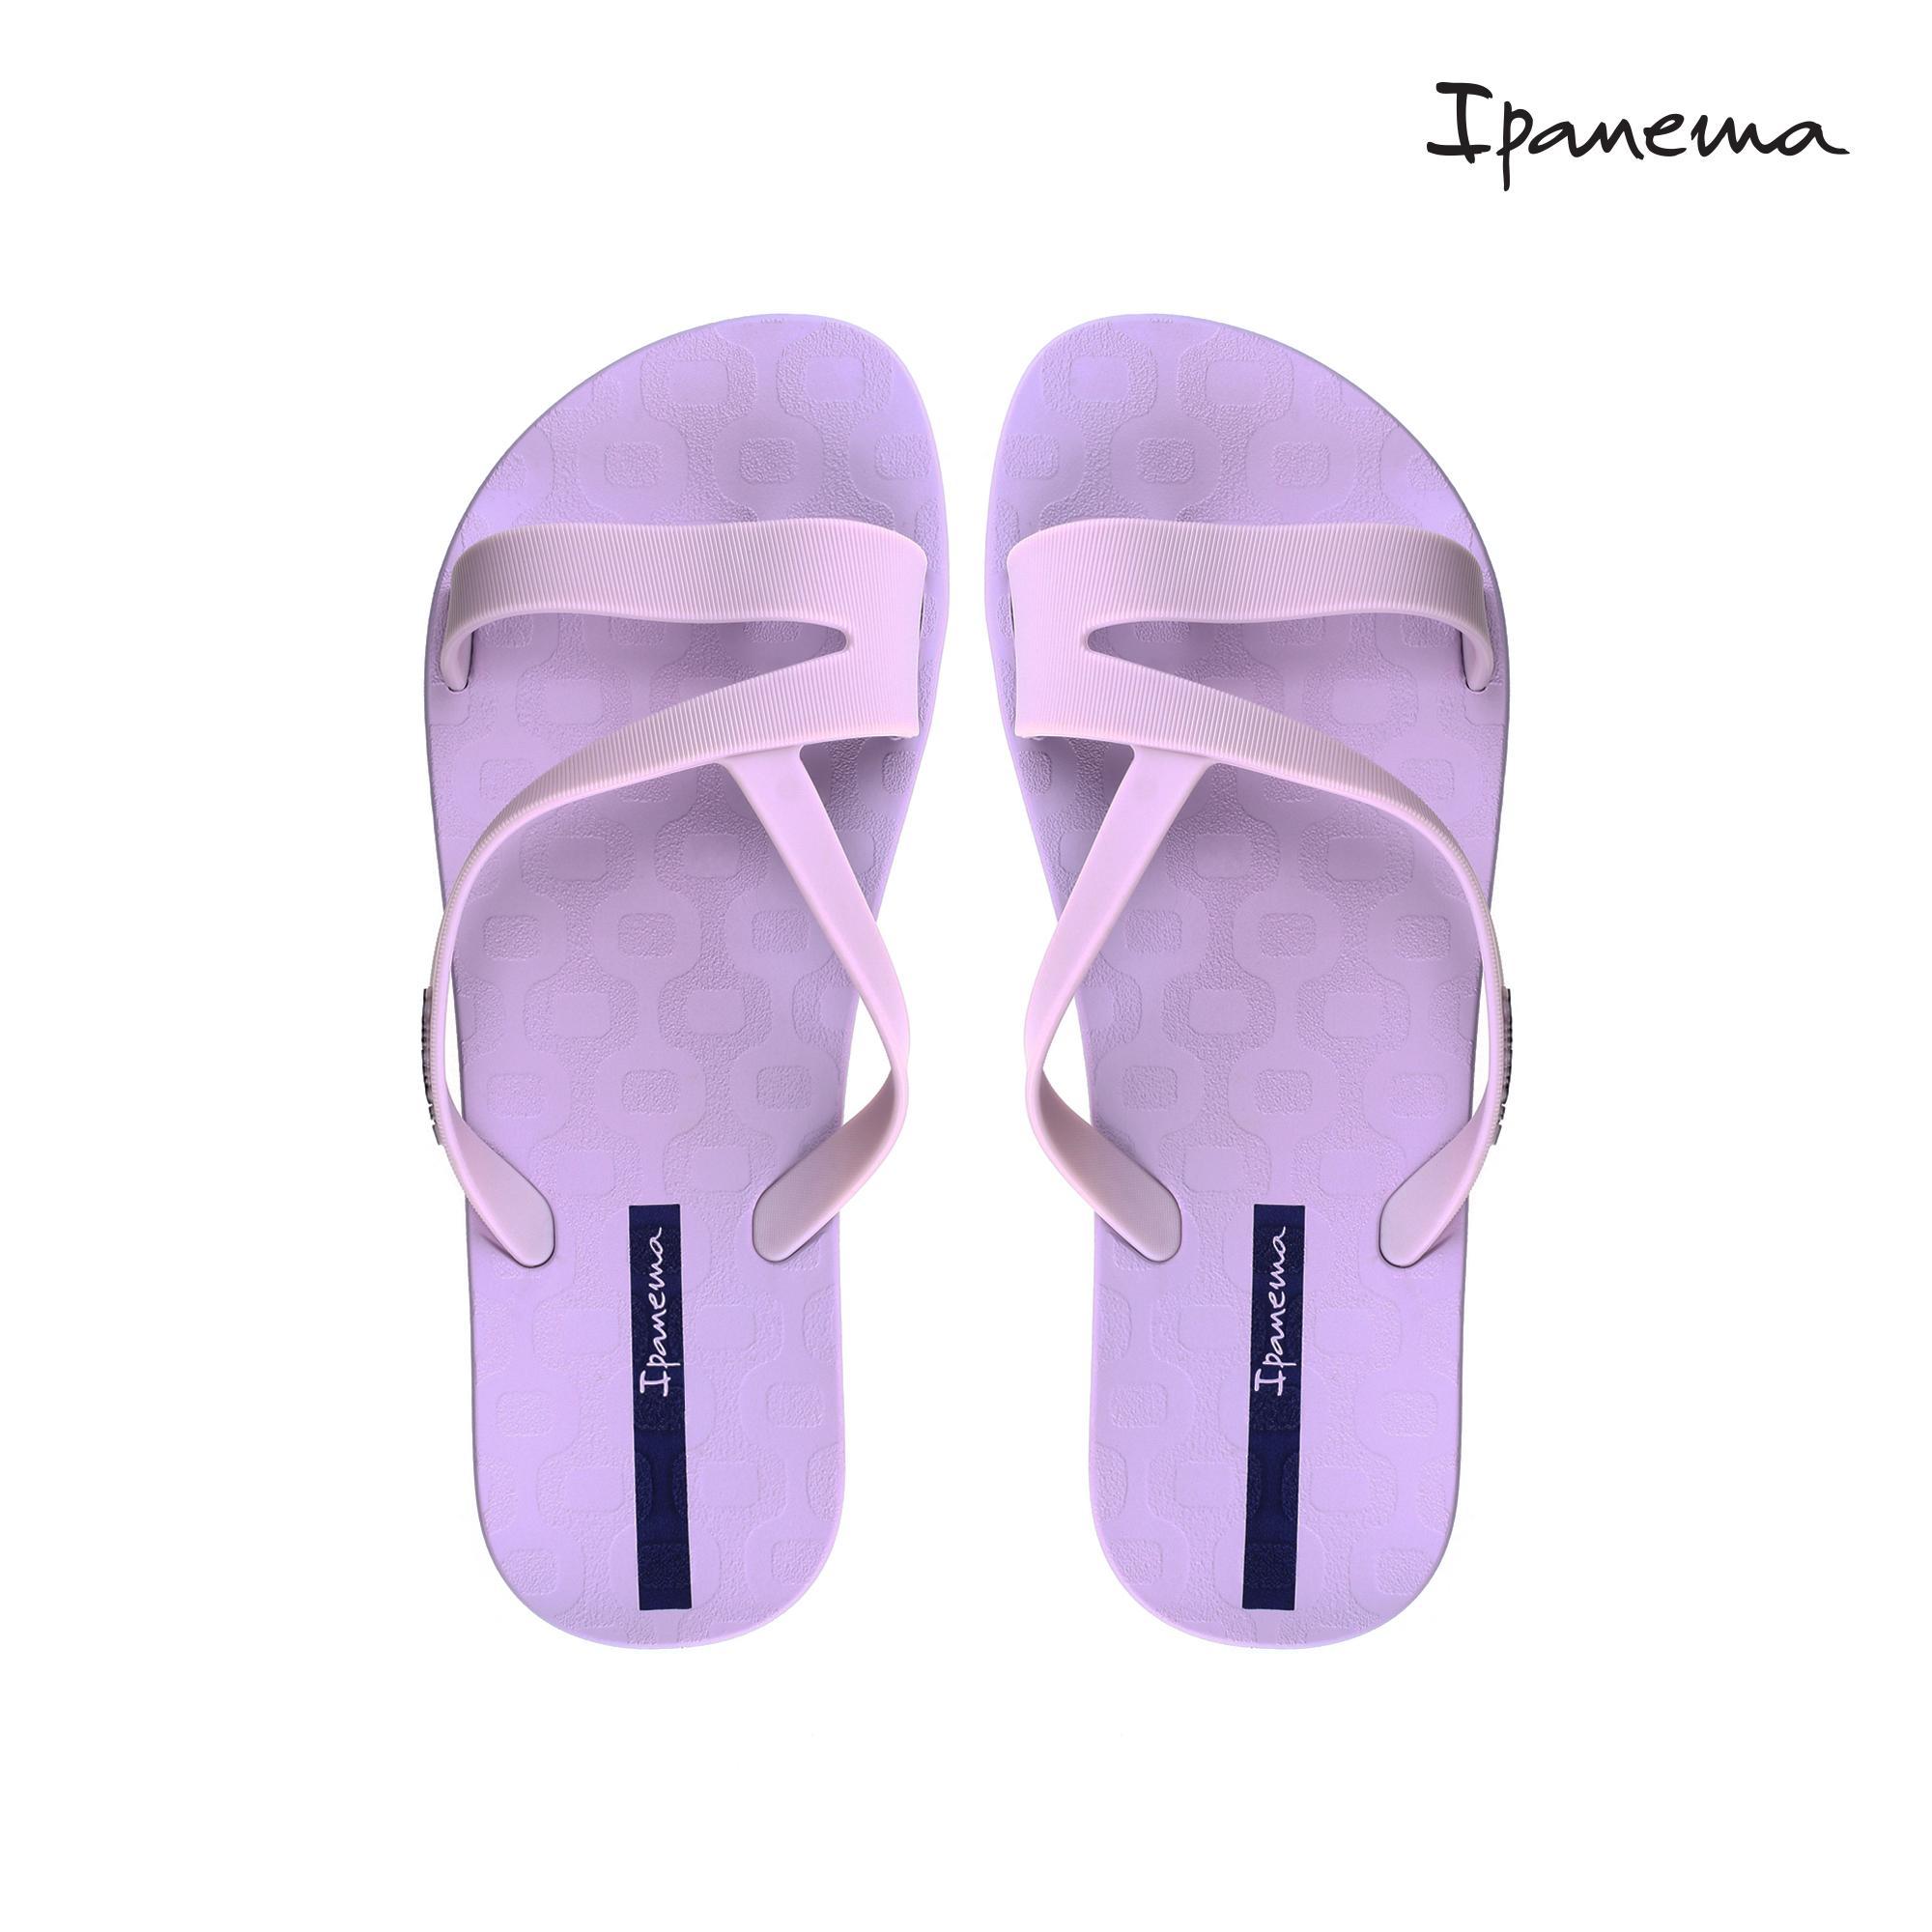 ee427bc0741b2d Ipanema Philippines  Ipanema price list - Ipanema Flip Flop ...